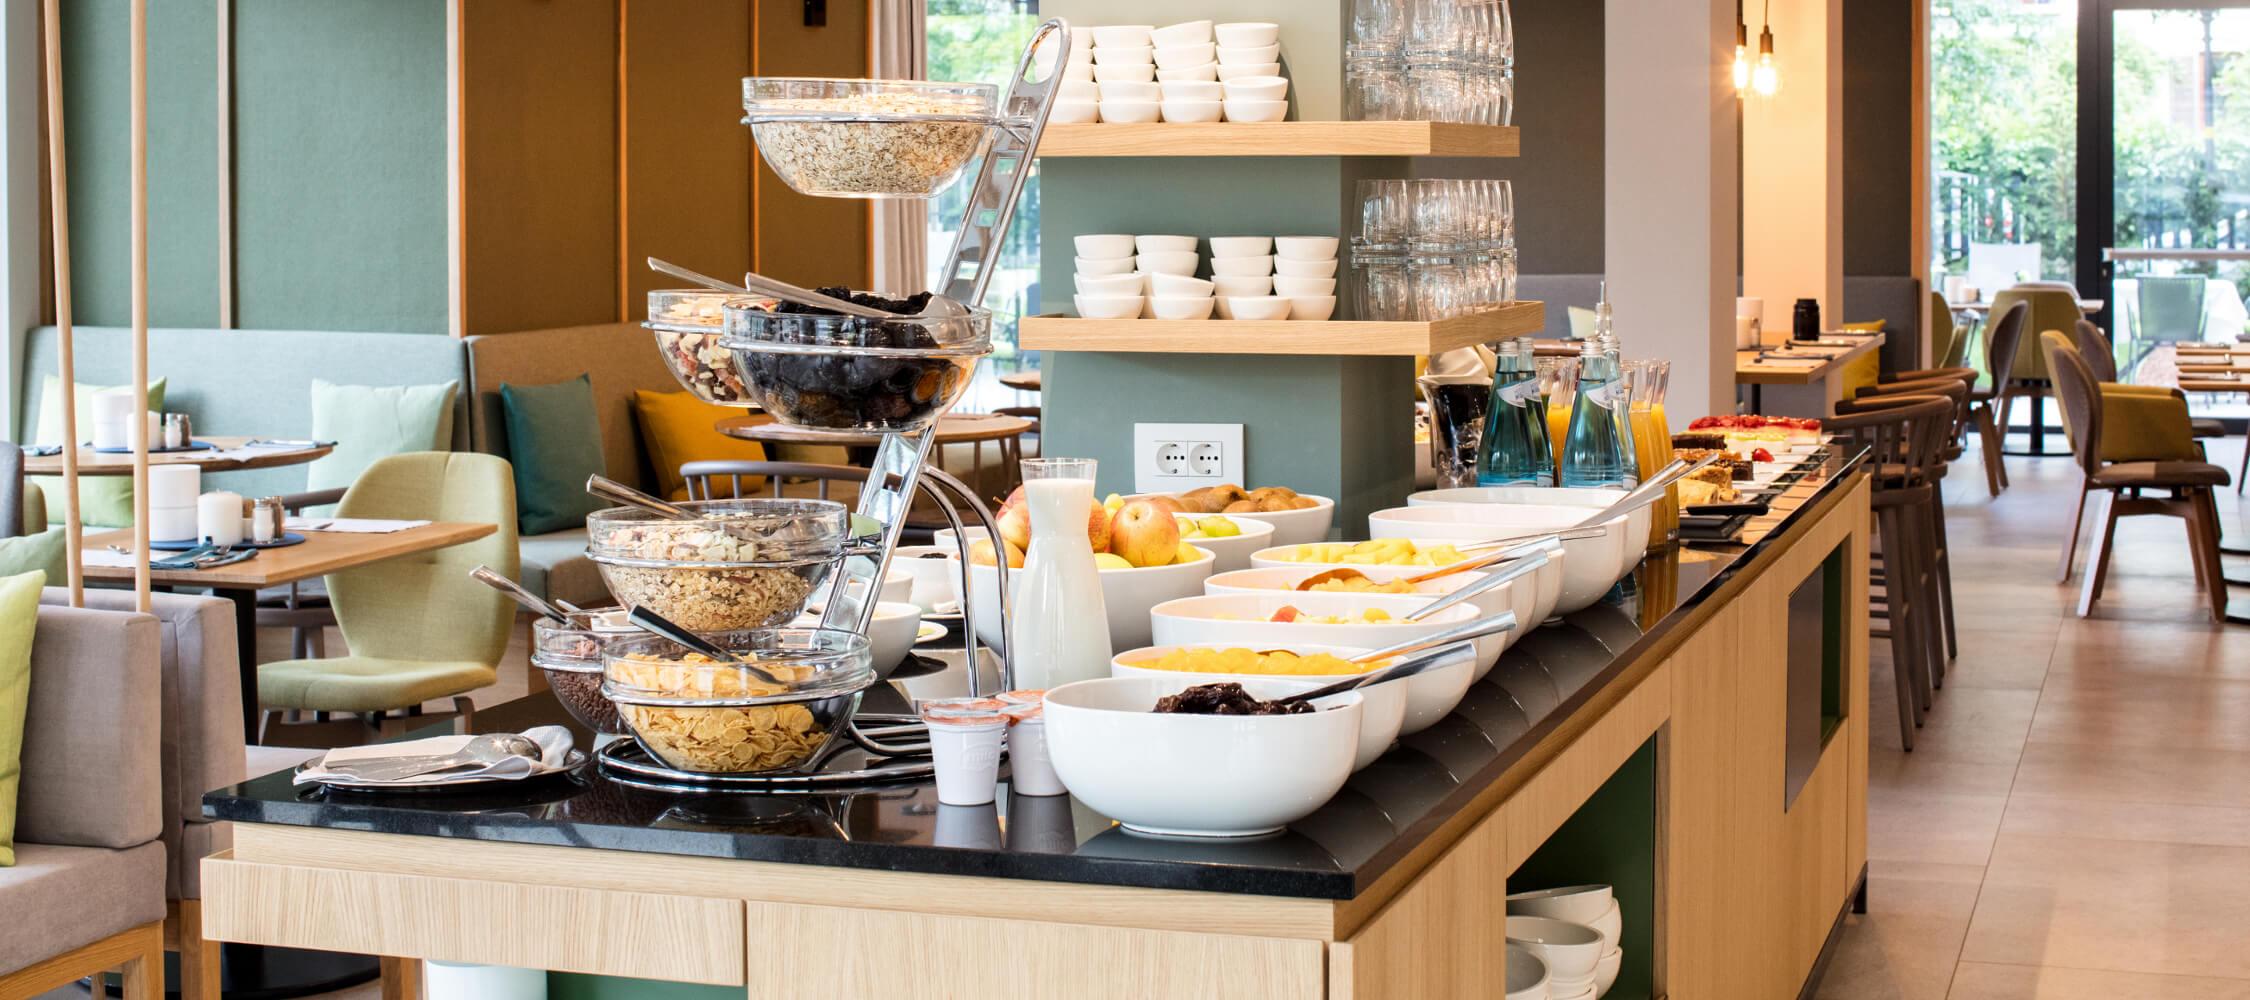 Hotel_Flora_Merano_Restaurant_Breakfast_Buffet_Fruehstueck_Essen_BeatricePilotto_3T1A3561_2250x1000